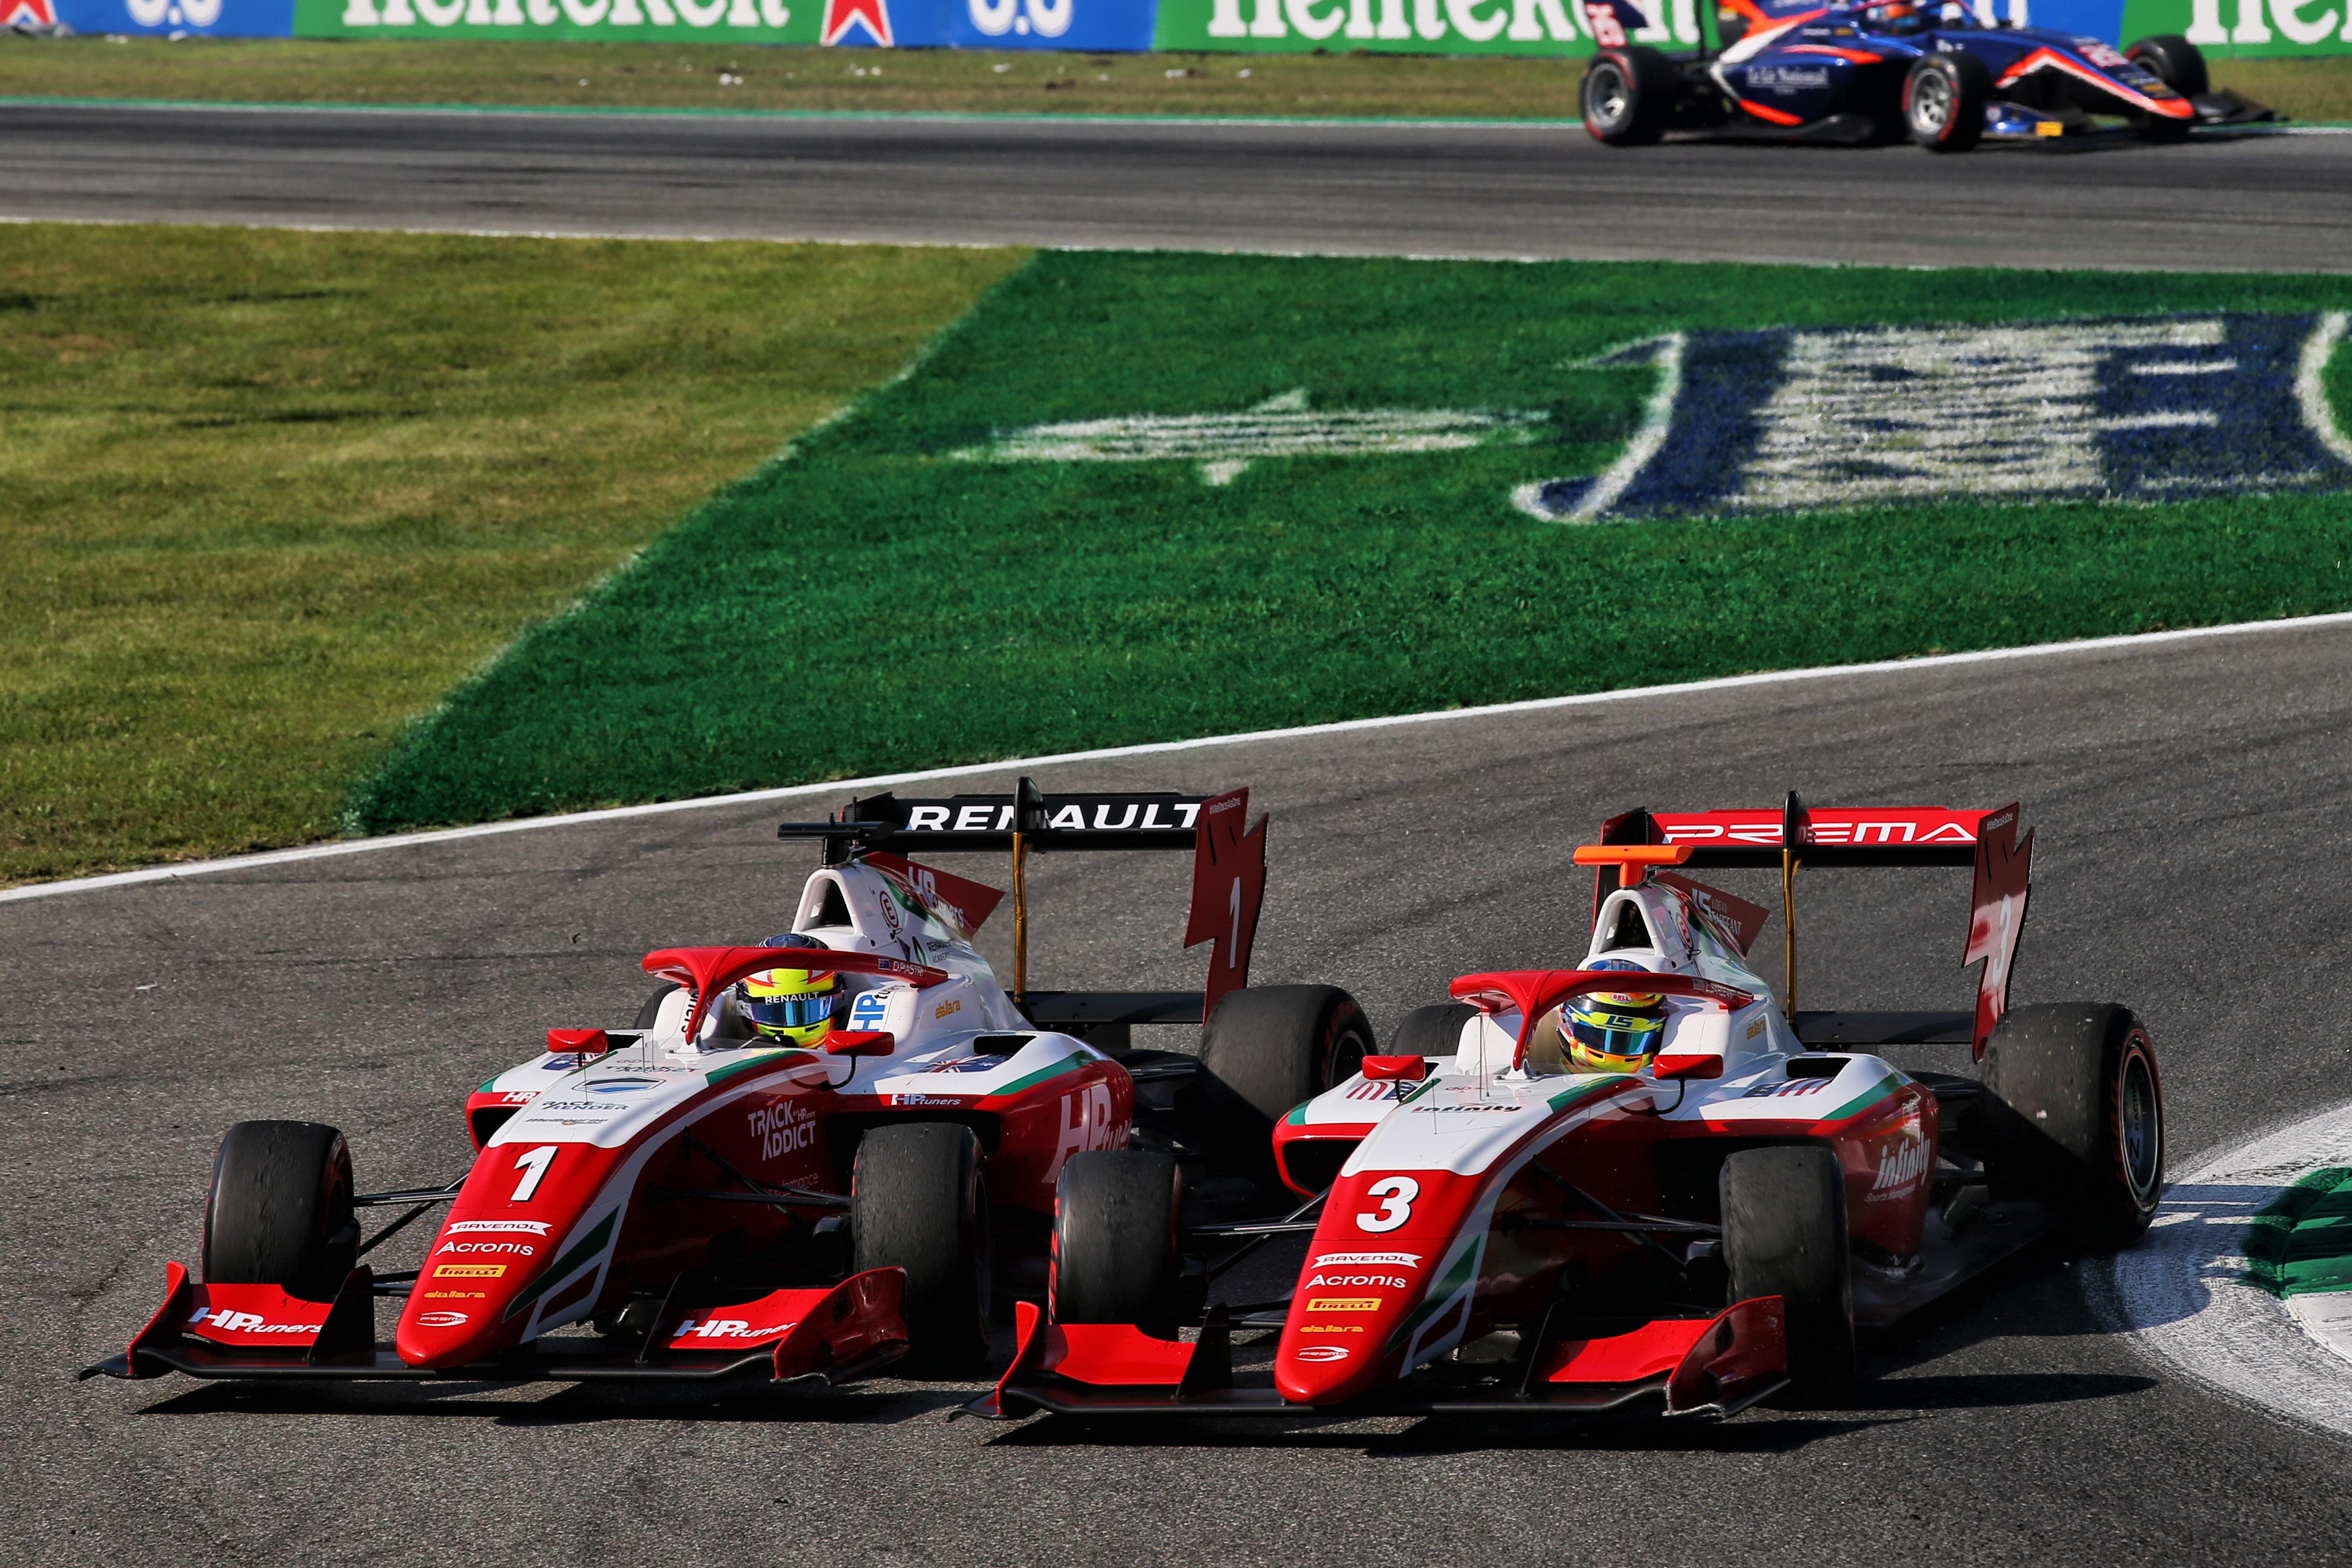 Motor Racing Fia Formula 3 Championship Saturday Monza, Italy